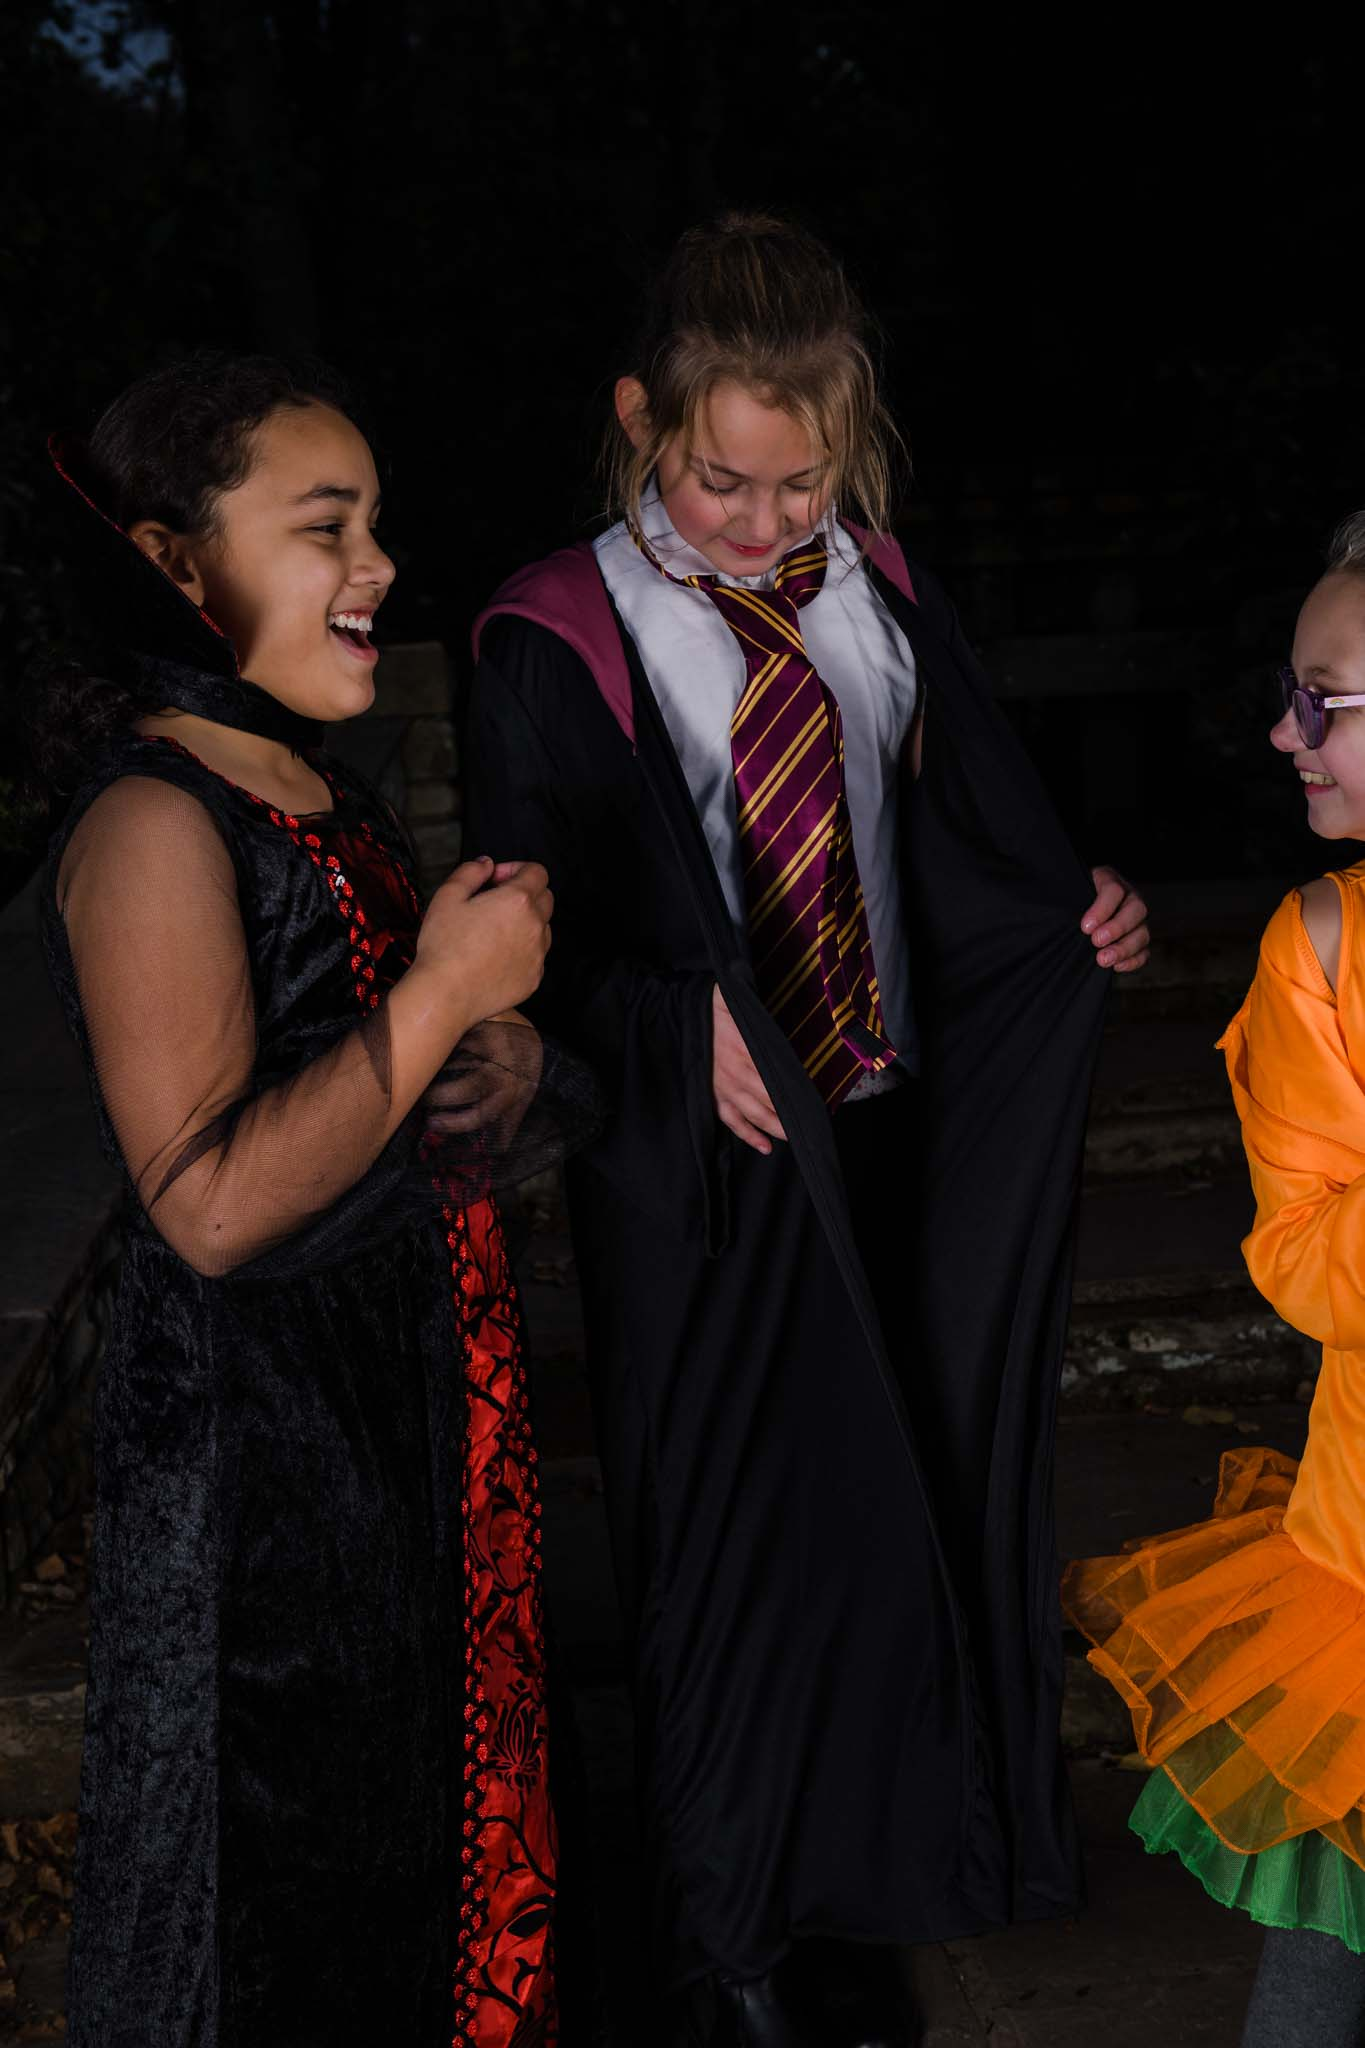 Vampire halloween costumes for girls